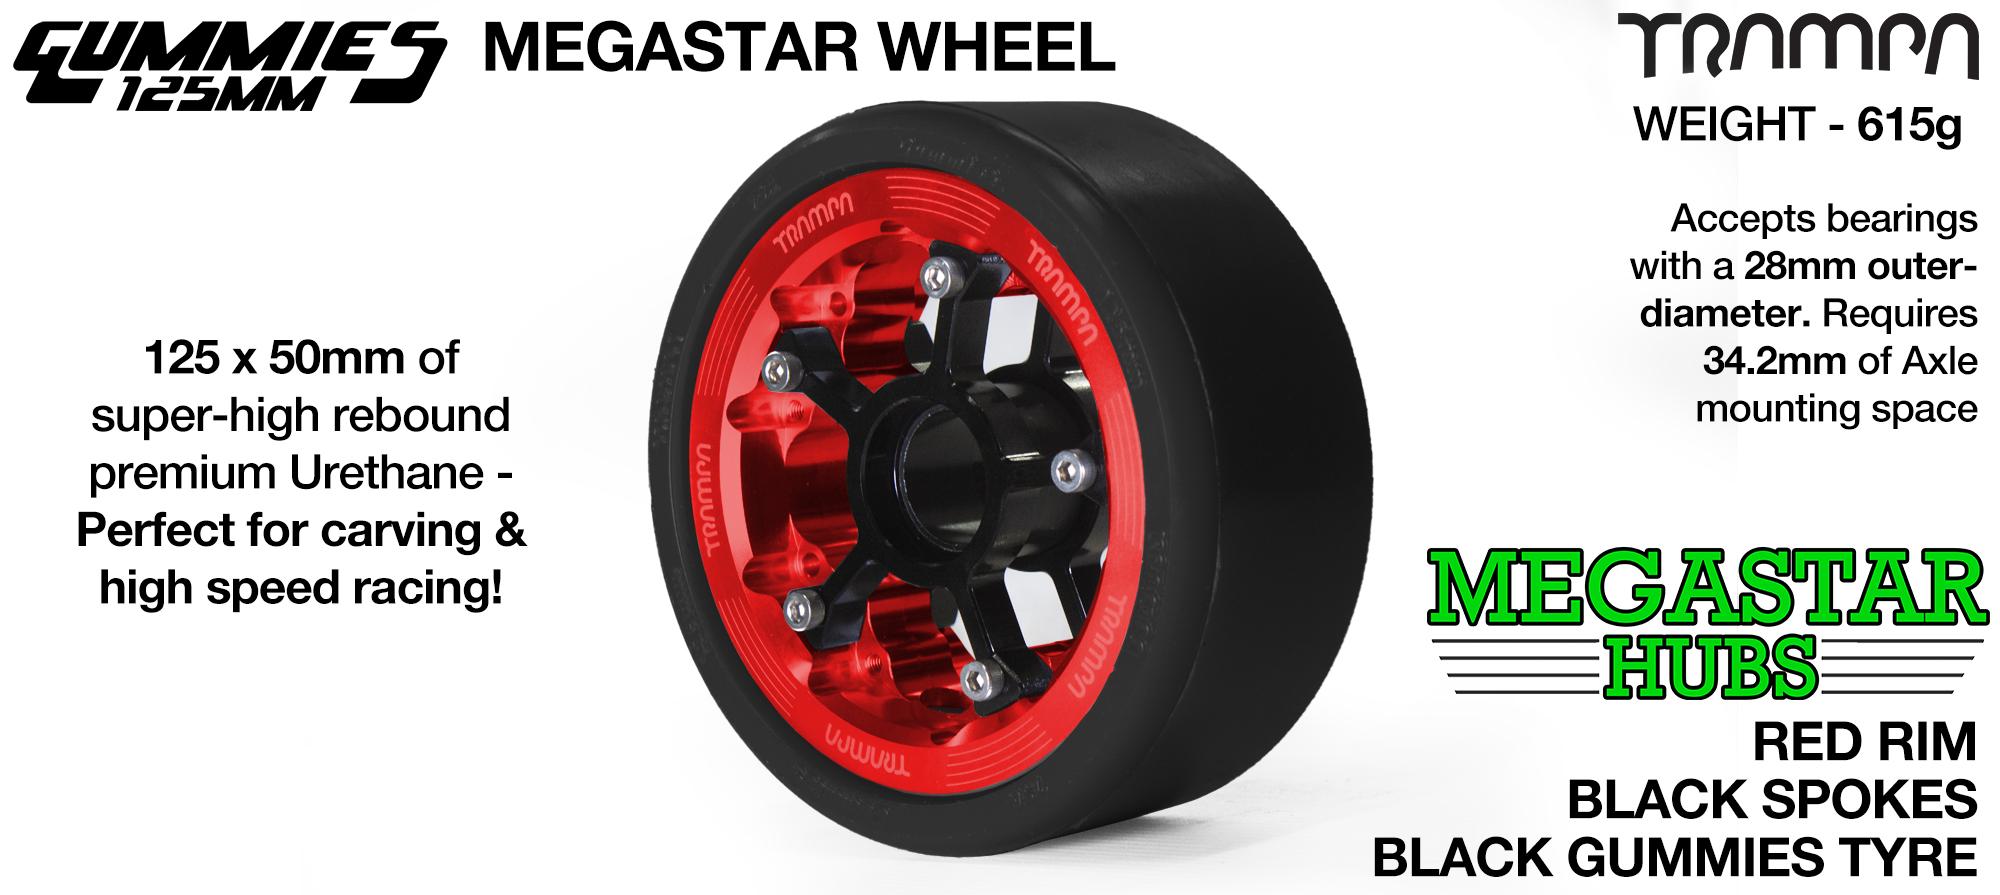 RED MEGASTAR Rim with BLACK Spokes & BLACK Gummies - The Ulrimate Longboard Wheel